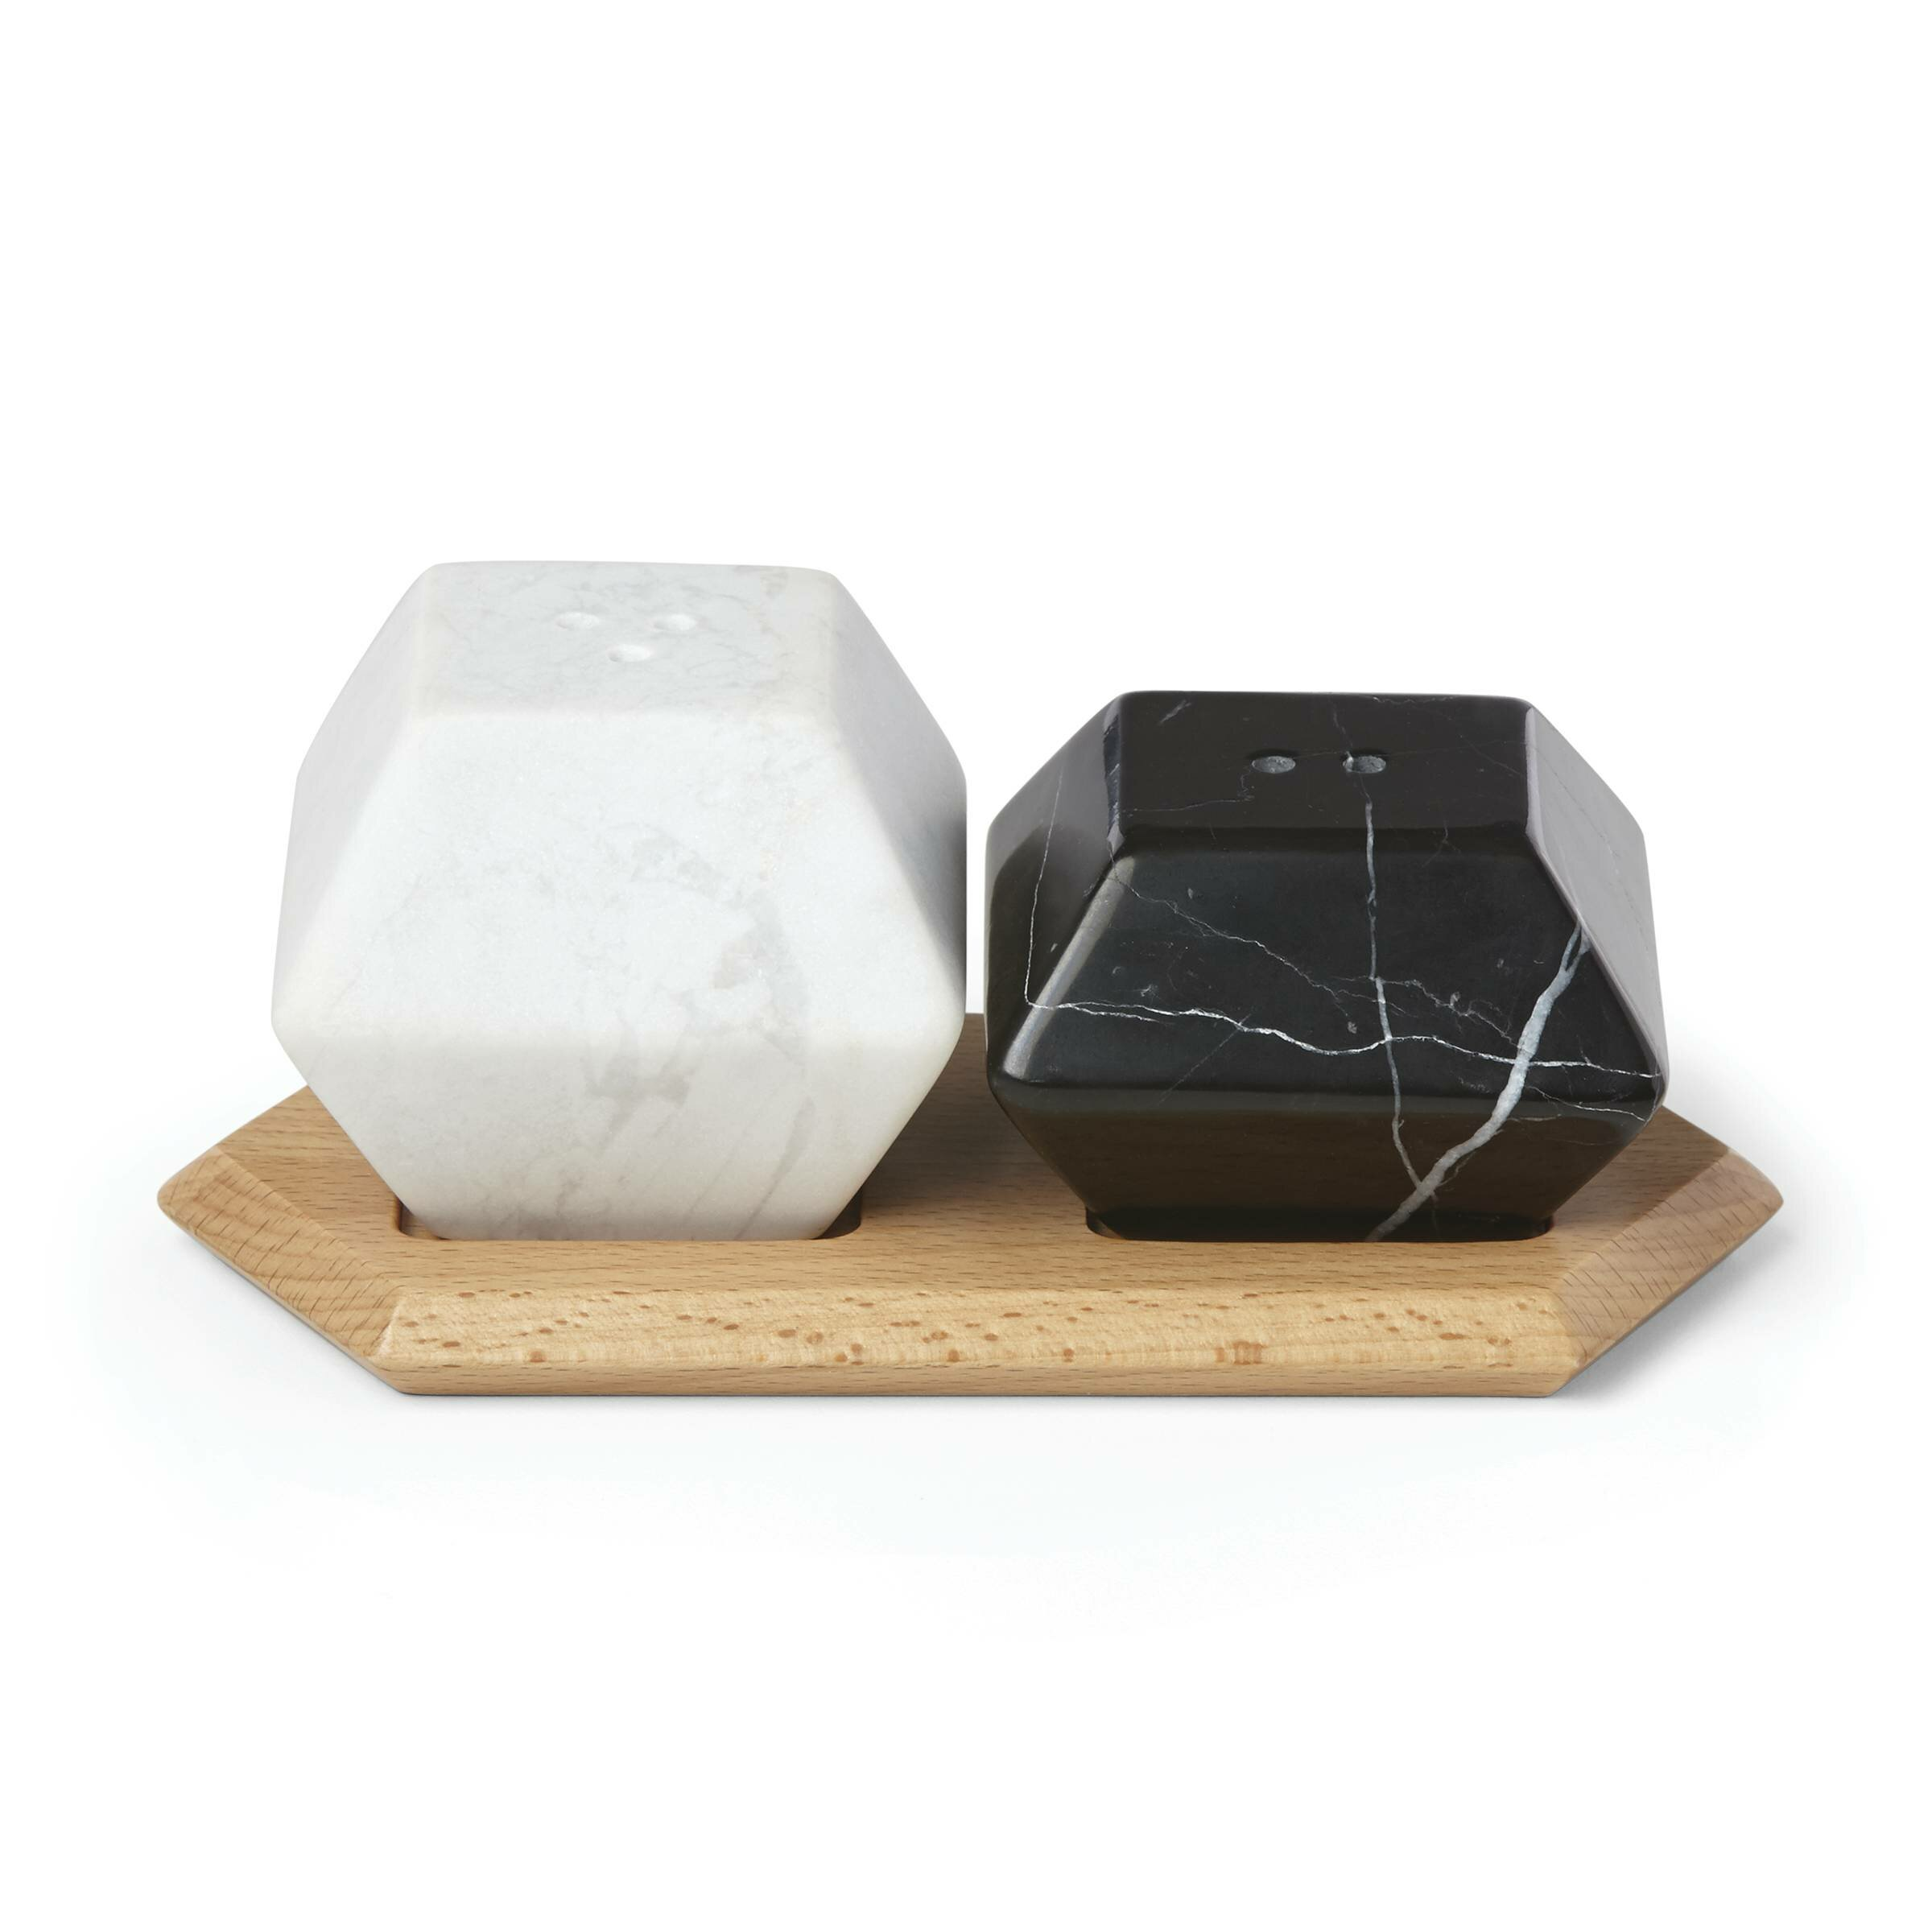 64fa85457e5 Platform Marble Salt   Pepper Shaker Set